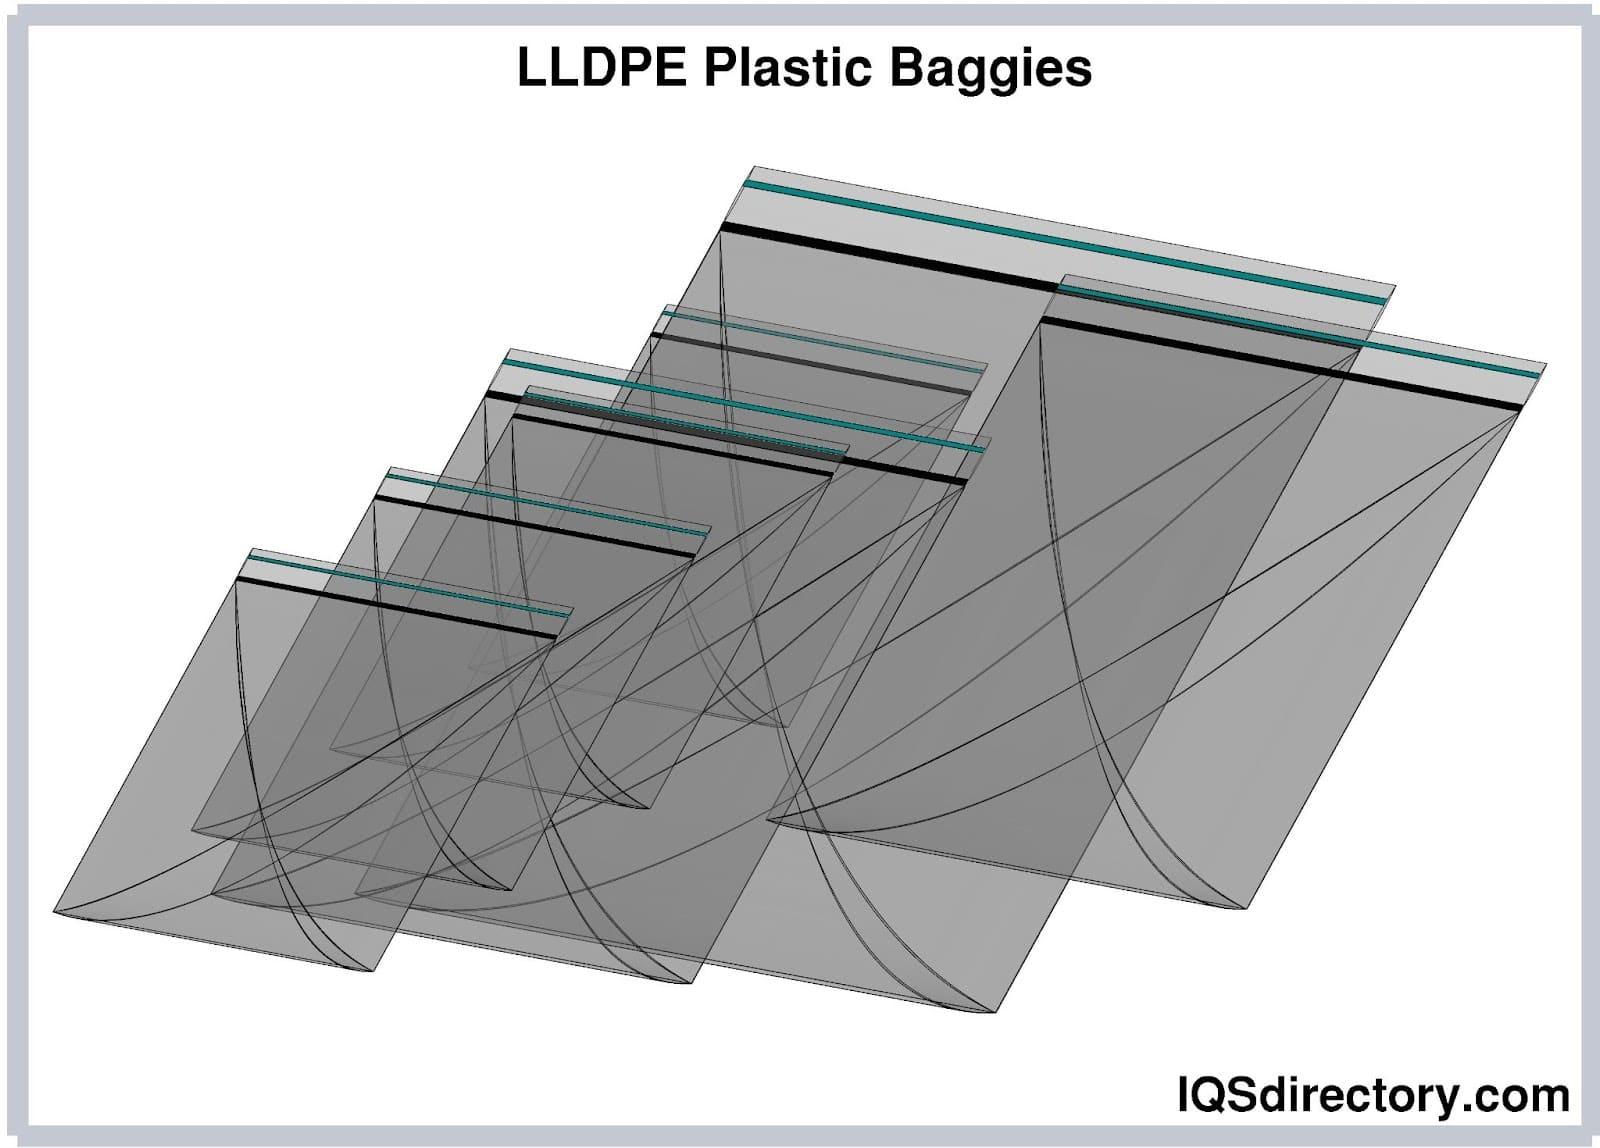 LLDPE Plastic Baggies